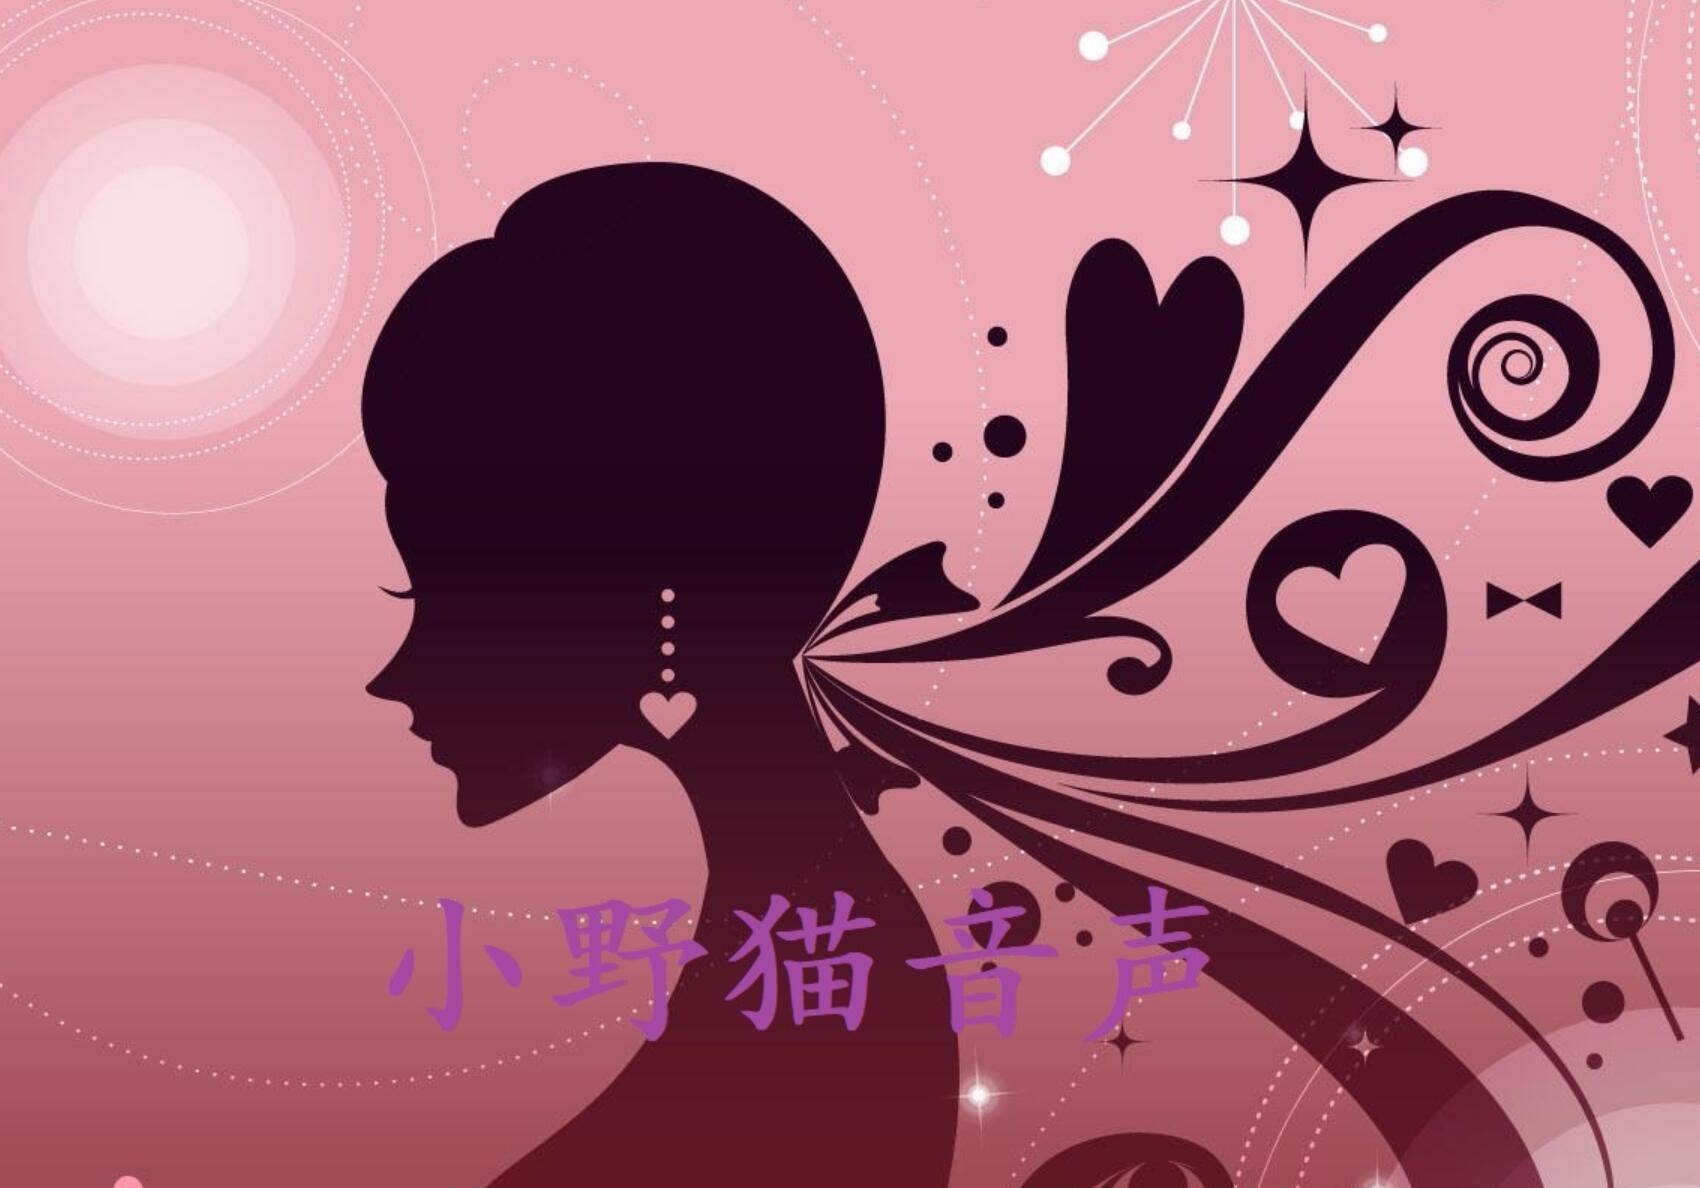 RJ326331 小野猫音声 双飞绿茶闺蜜 CV青梅 CV小优 [20210503]